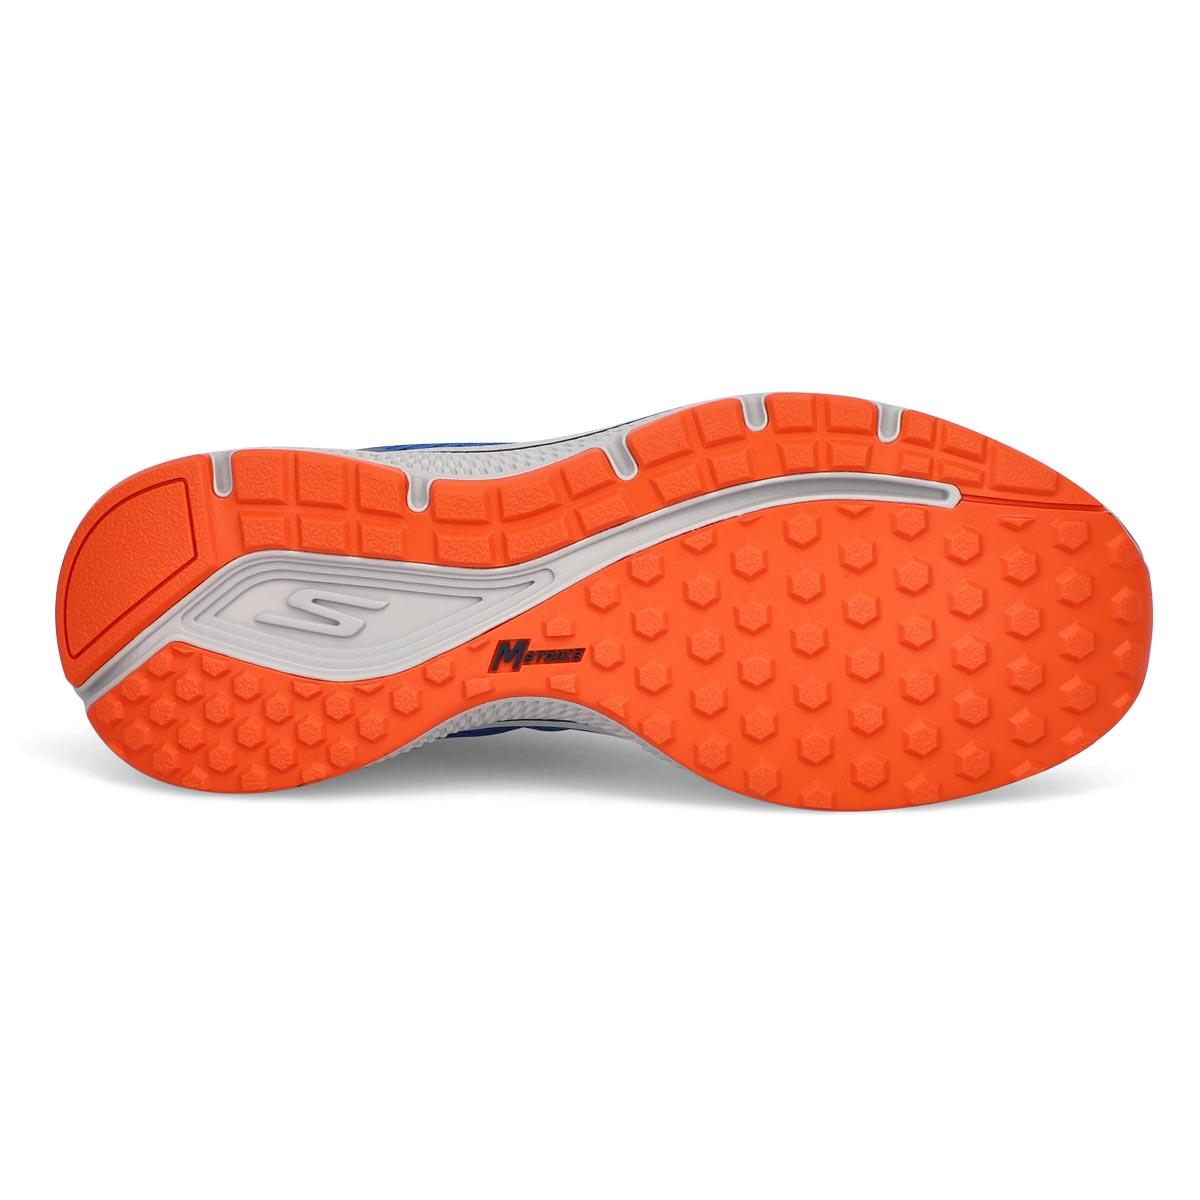 Men's Go Run Running Shoes - Blue/ Orange